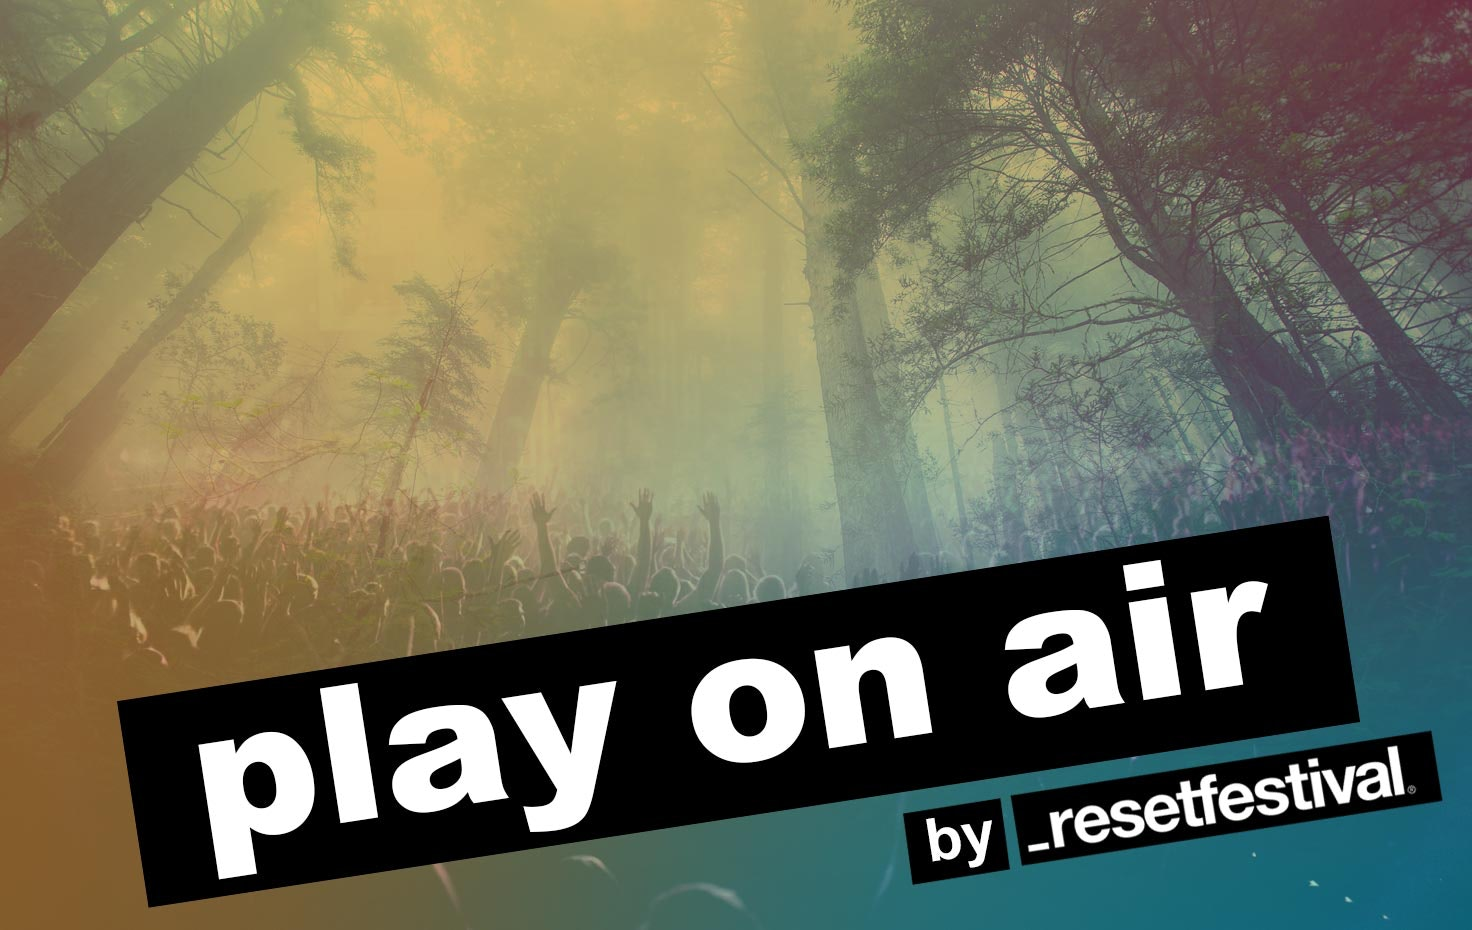 Play on air